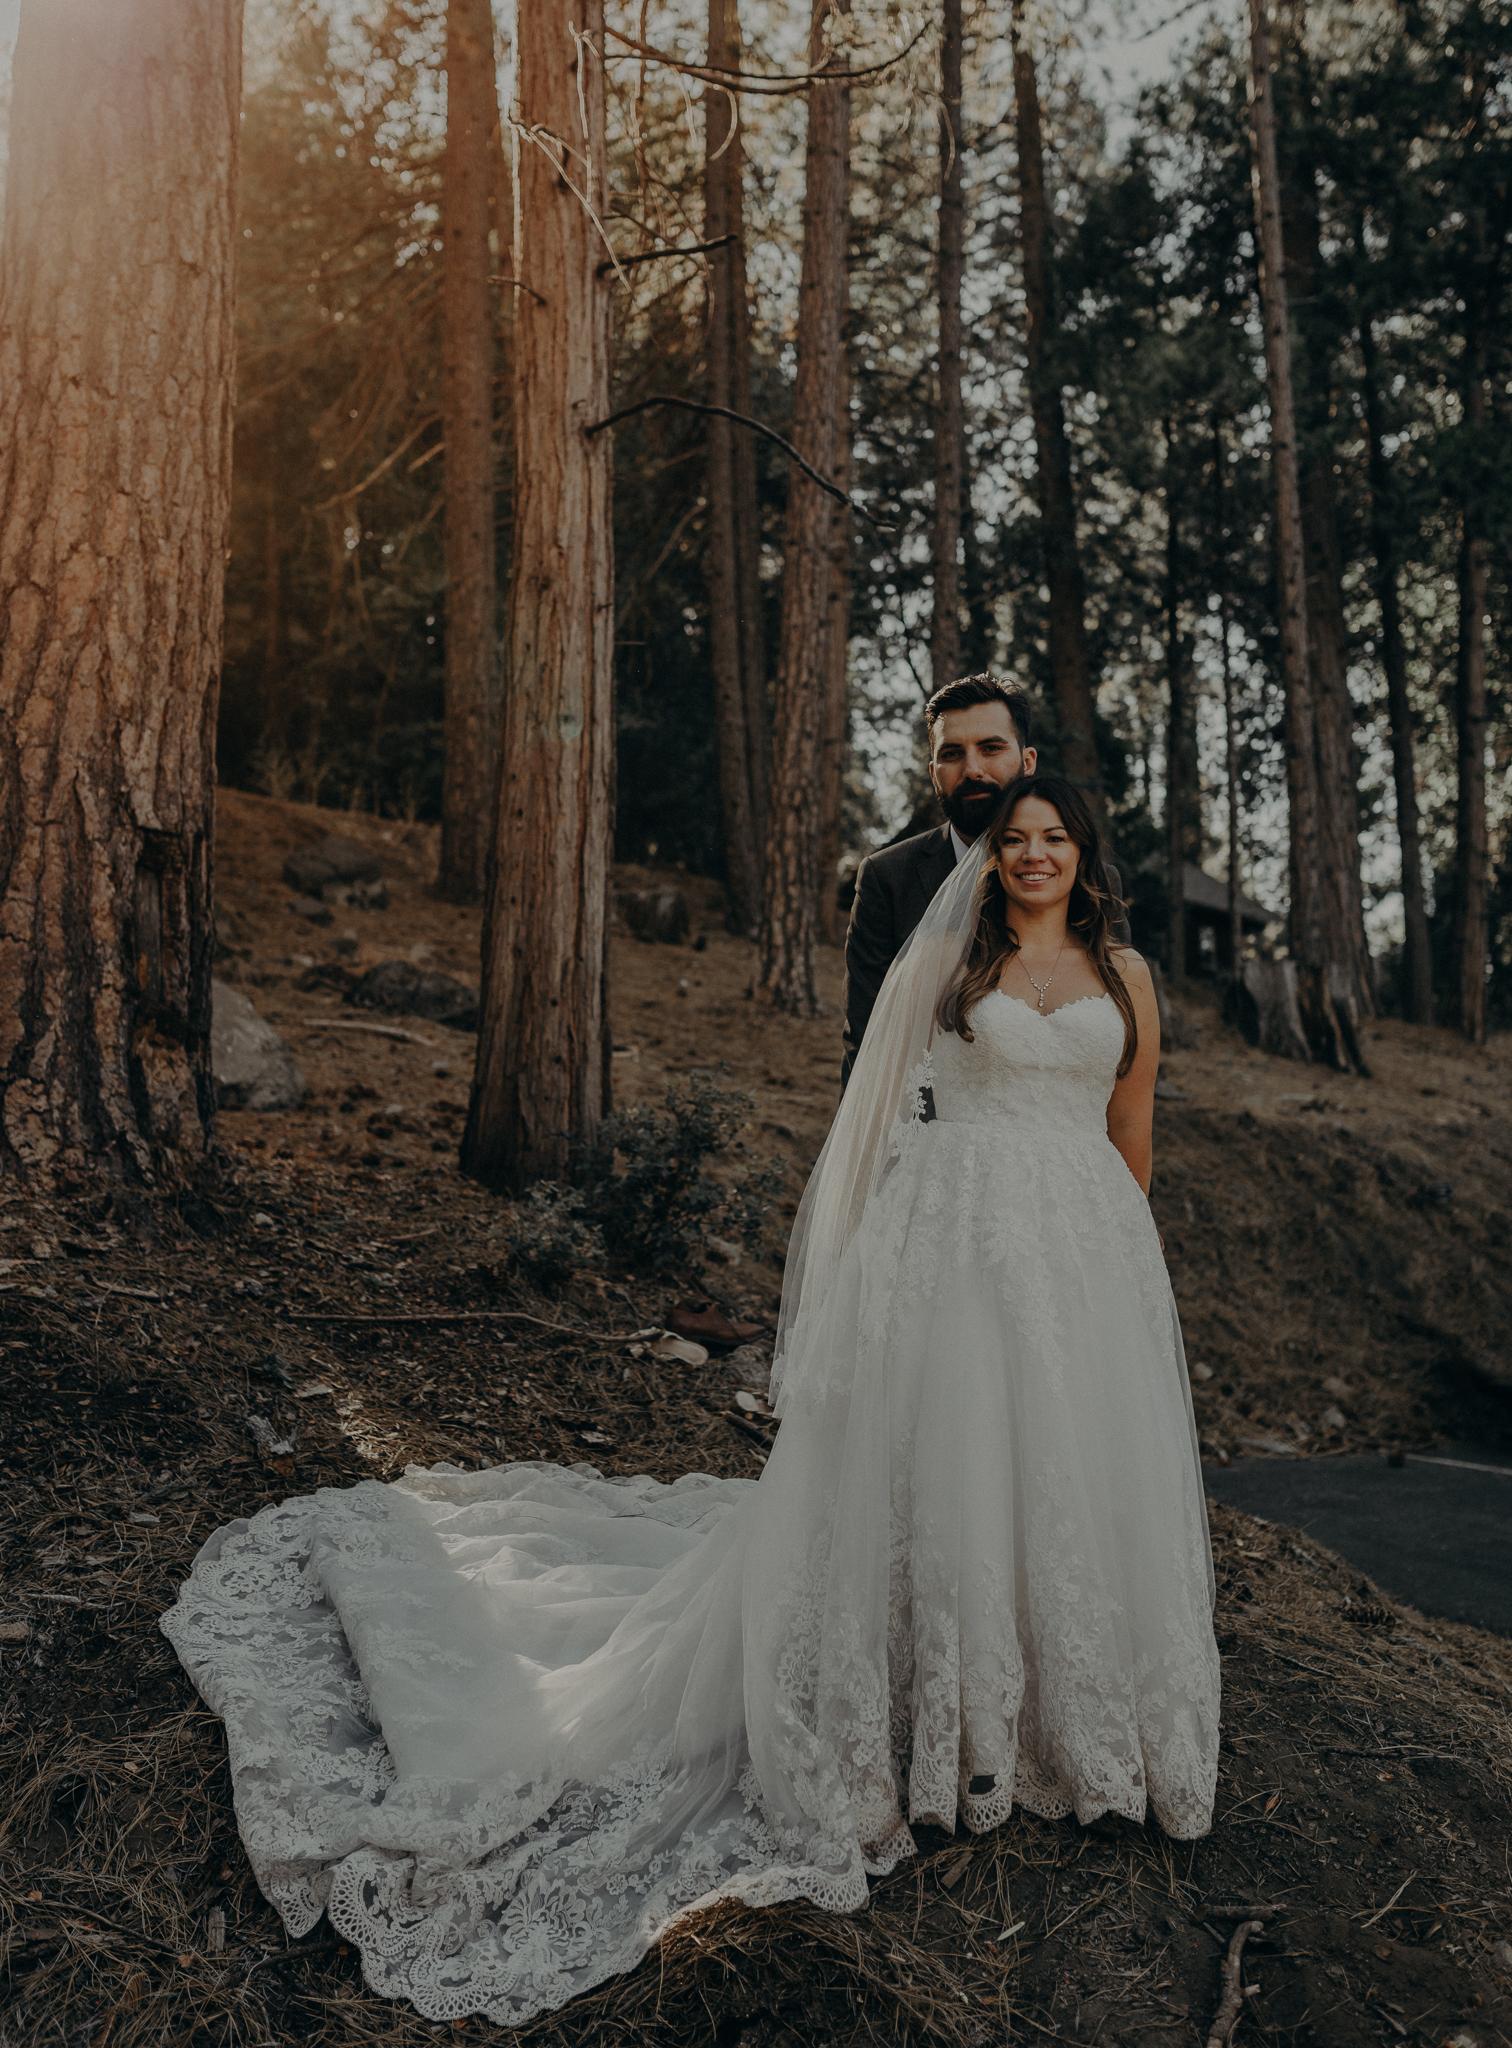 Yosemite Elopement Photographer - Evergreen Lodge Wedding Photographer - IsaiahAndTaylor.com-114.jpg